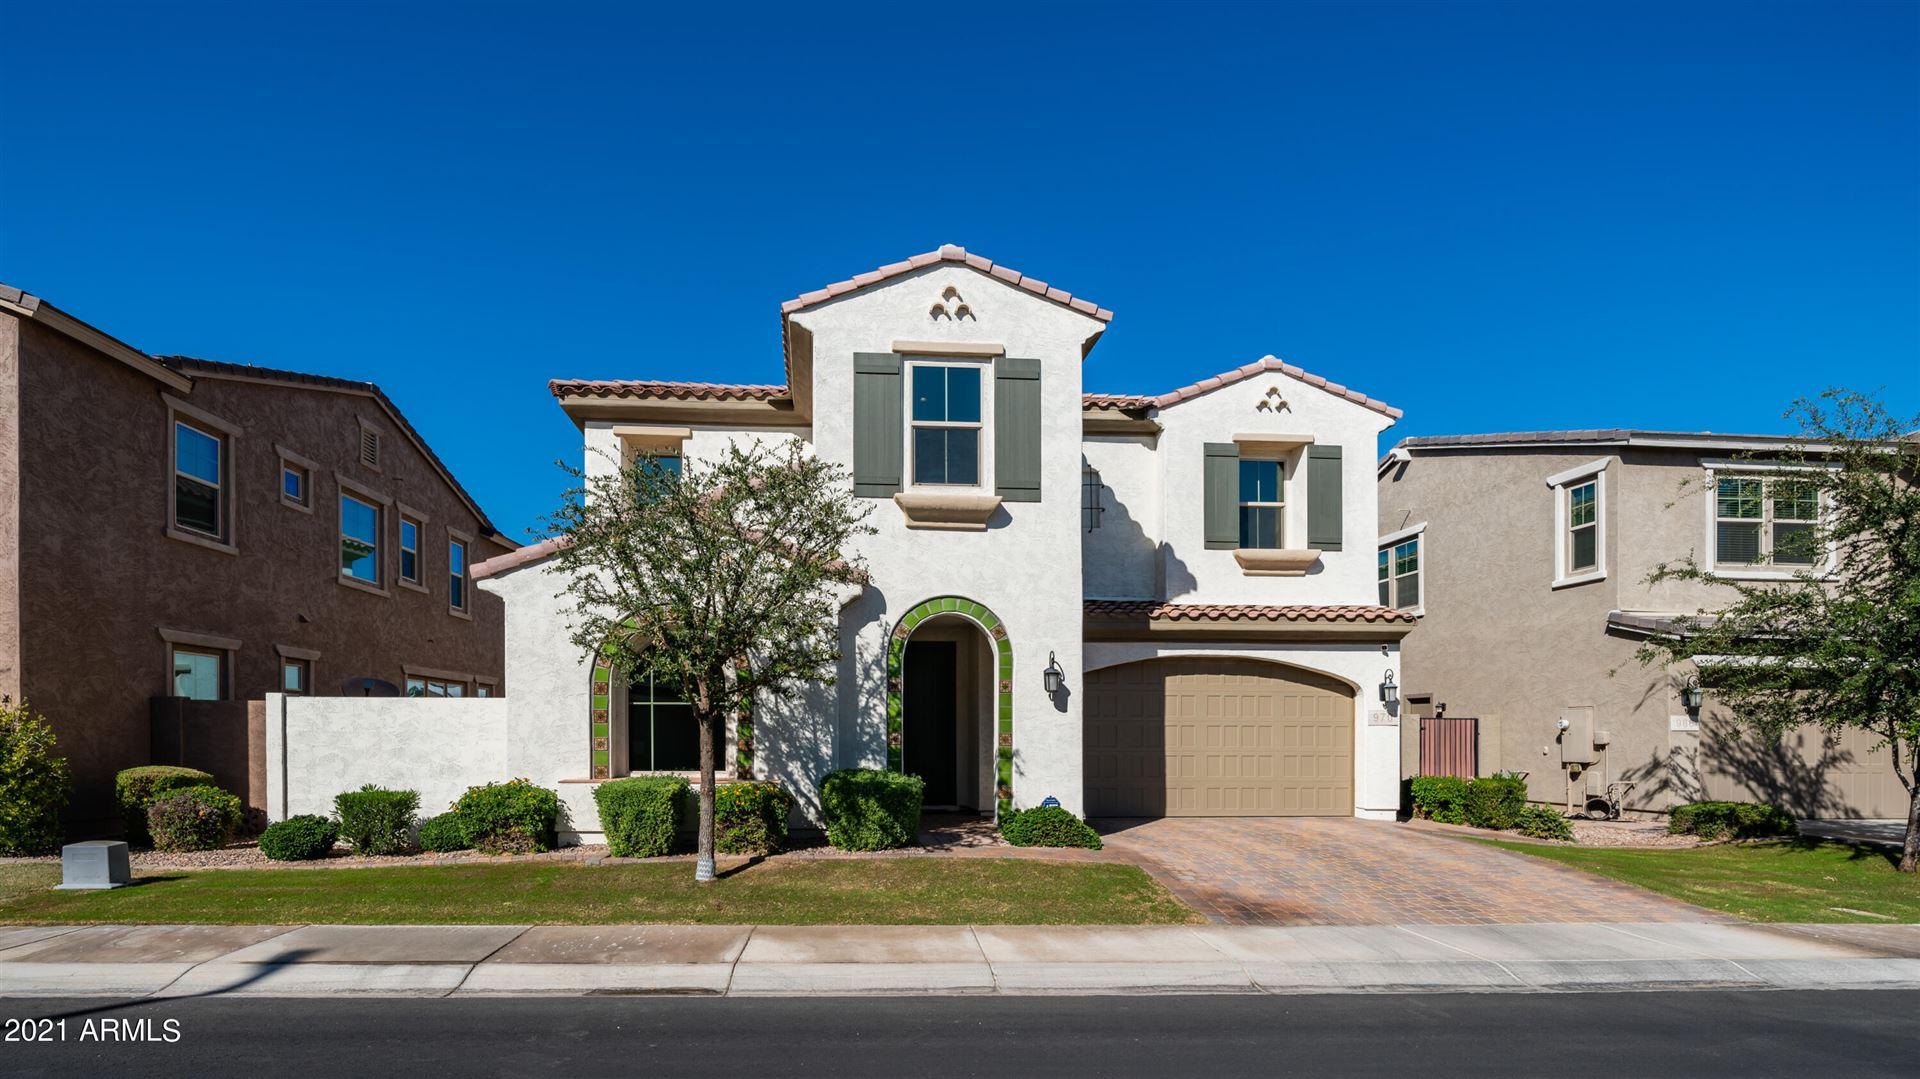 Photo of 970 W ZION Way, Chandler, AZ 85248 (MLS # 6307543)